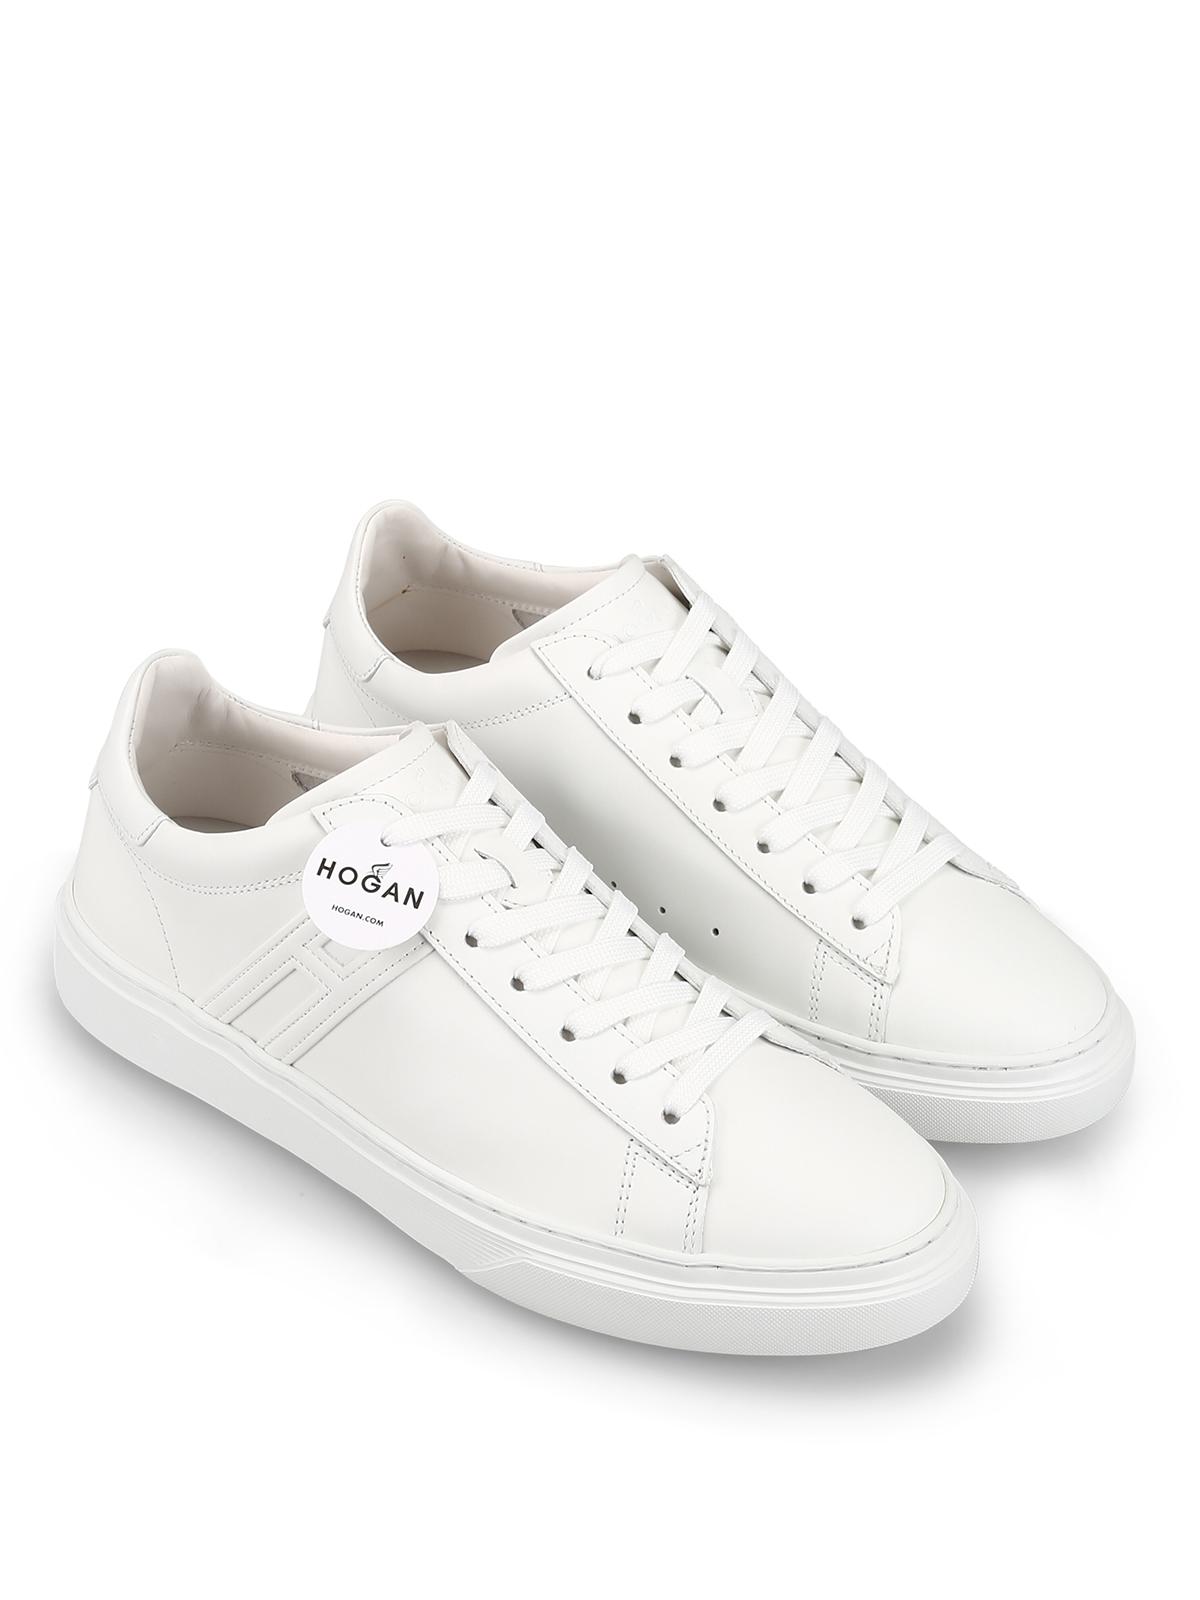 HOGAN scarpe uomo Sneaker H365 in pelle bianco HXM3650BD60KO74266